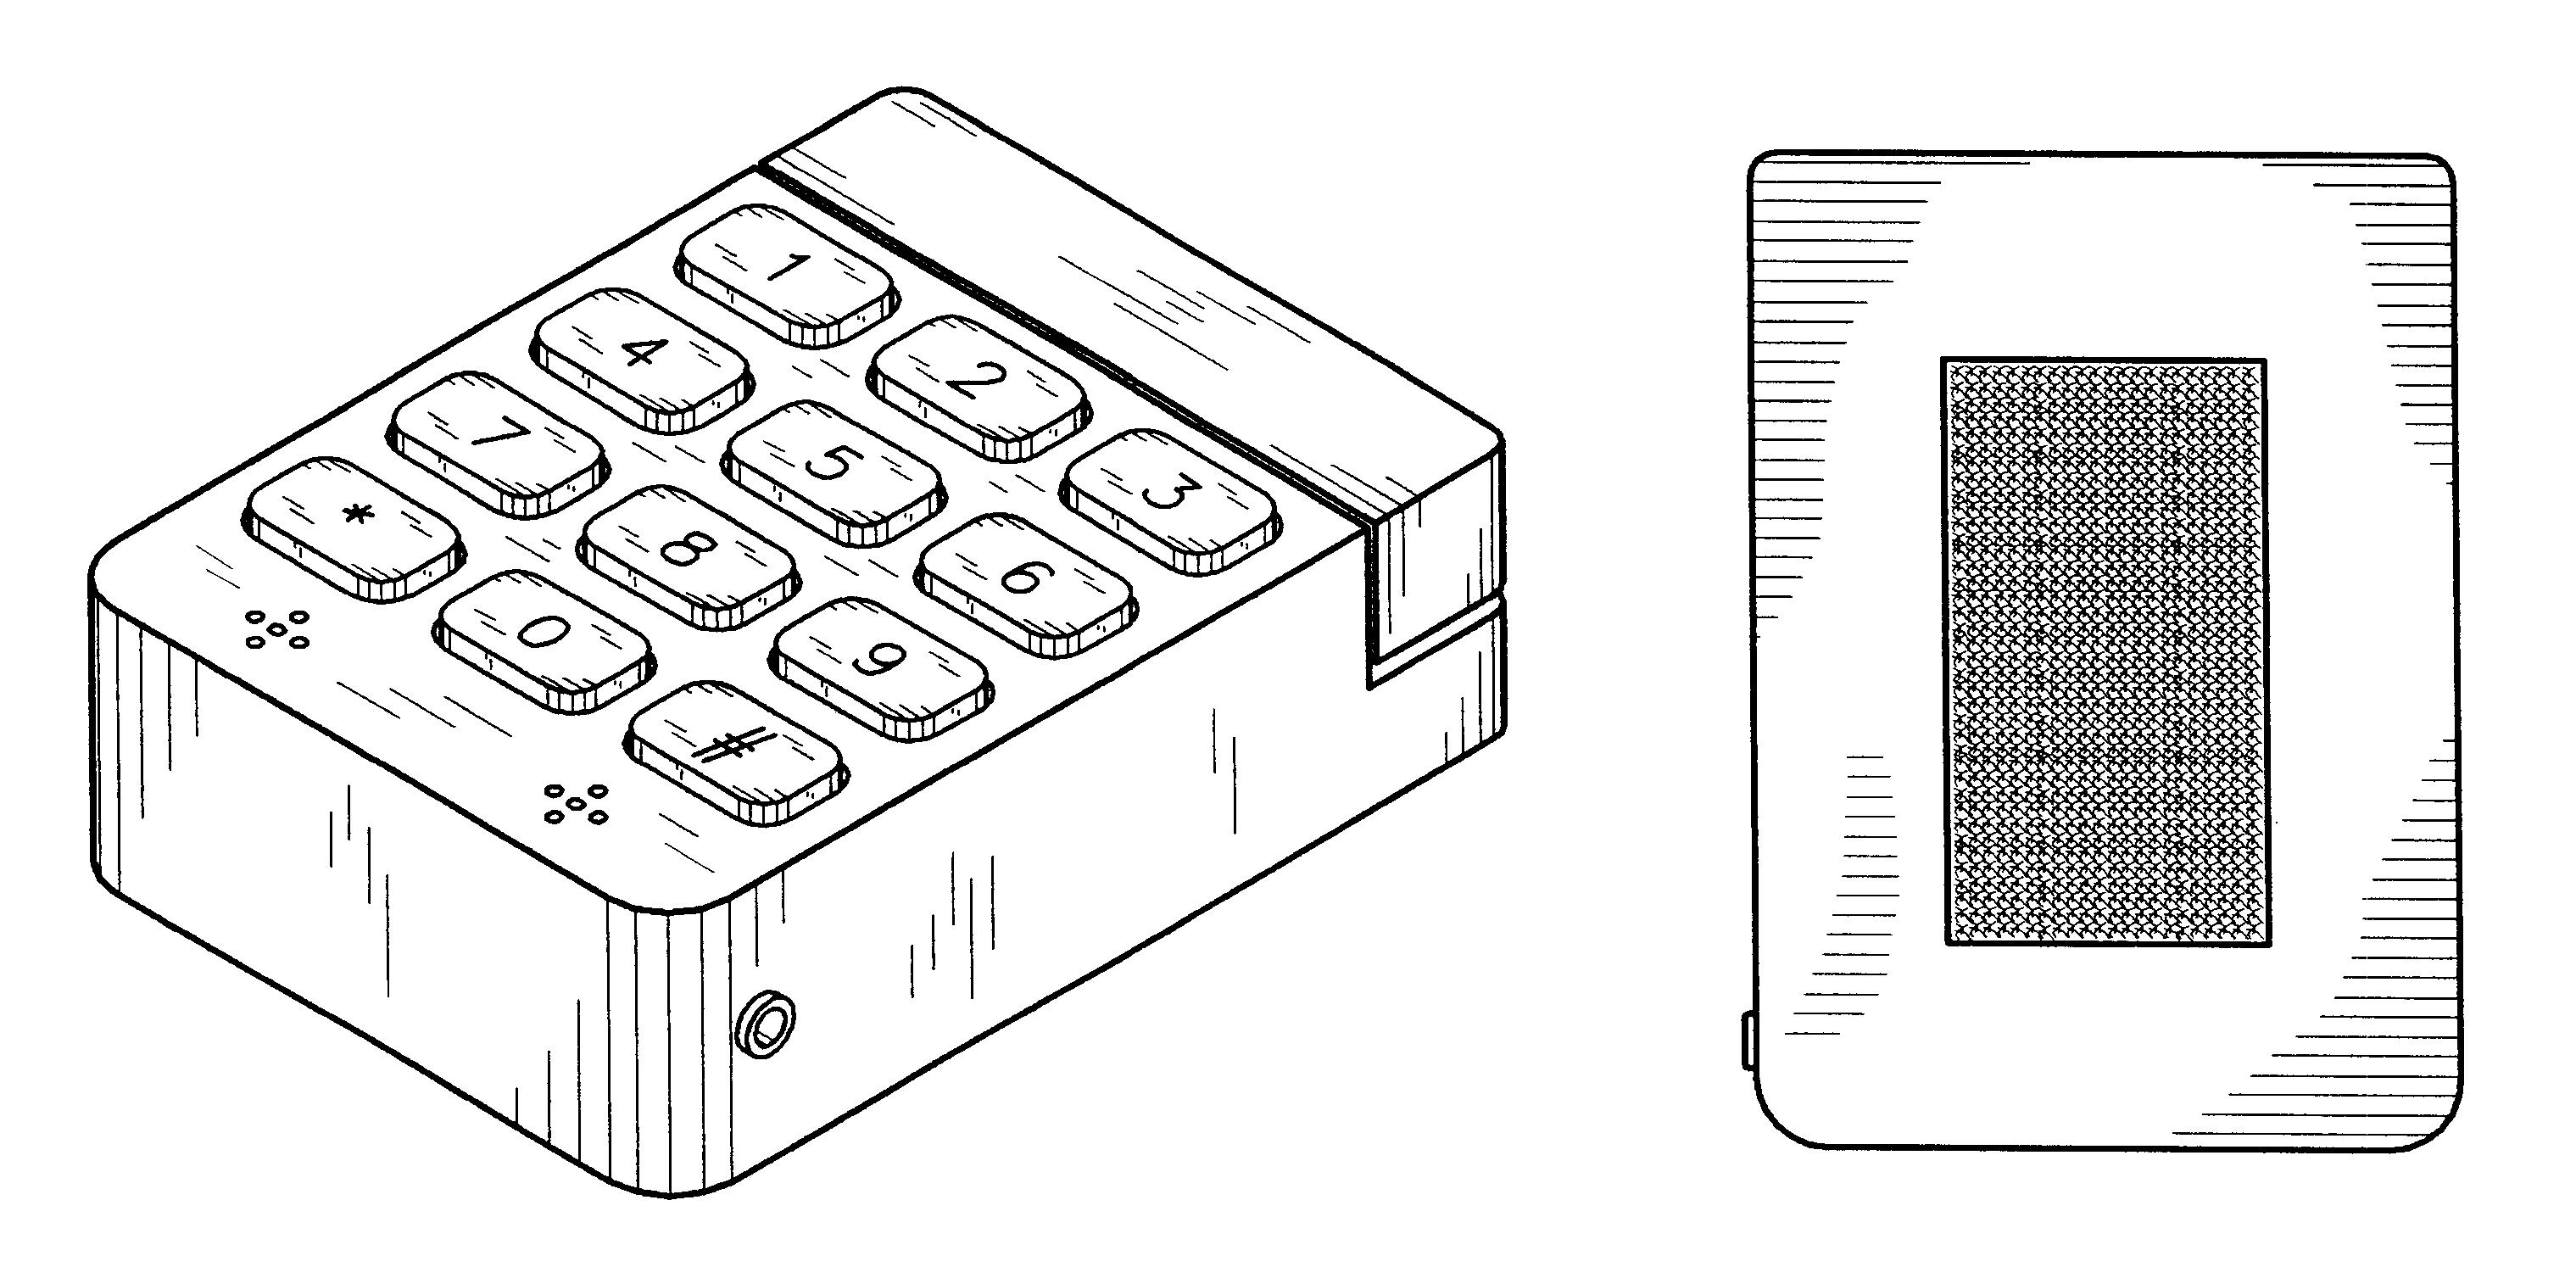 patent usd538274 - cell phone keypad